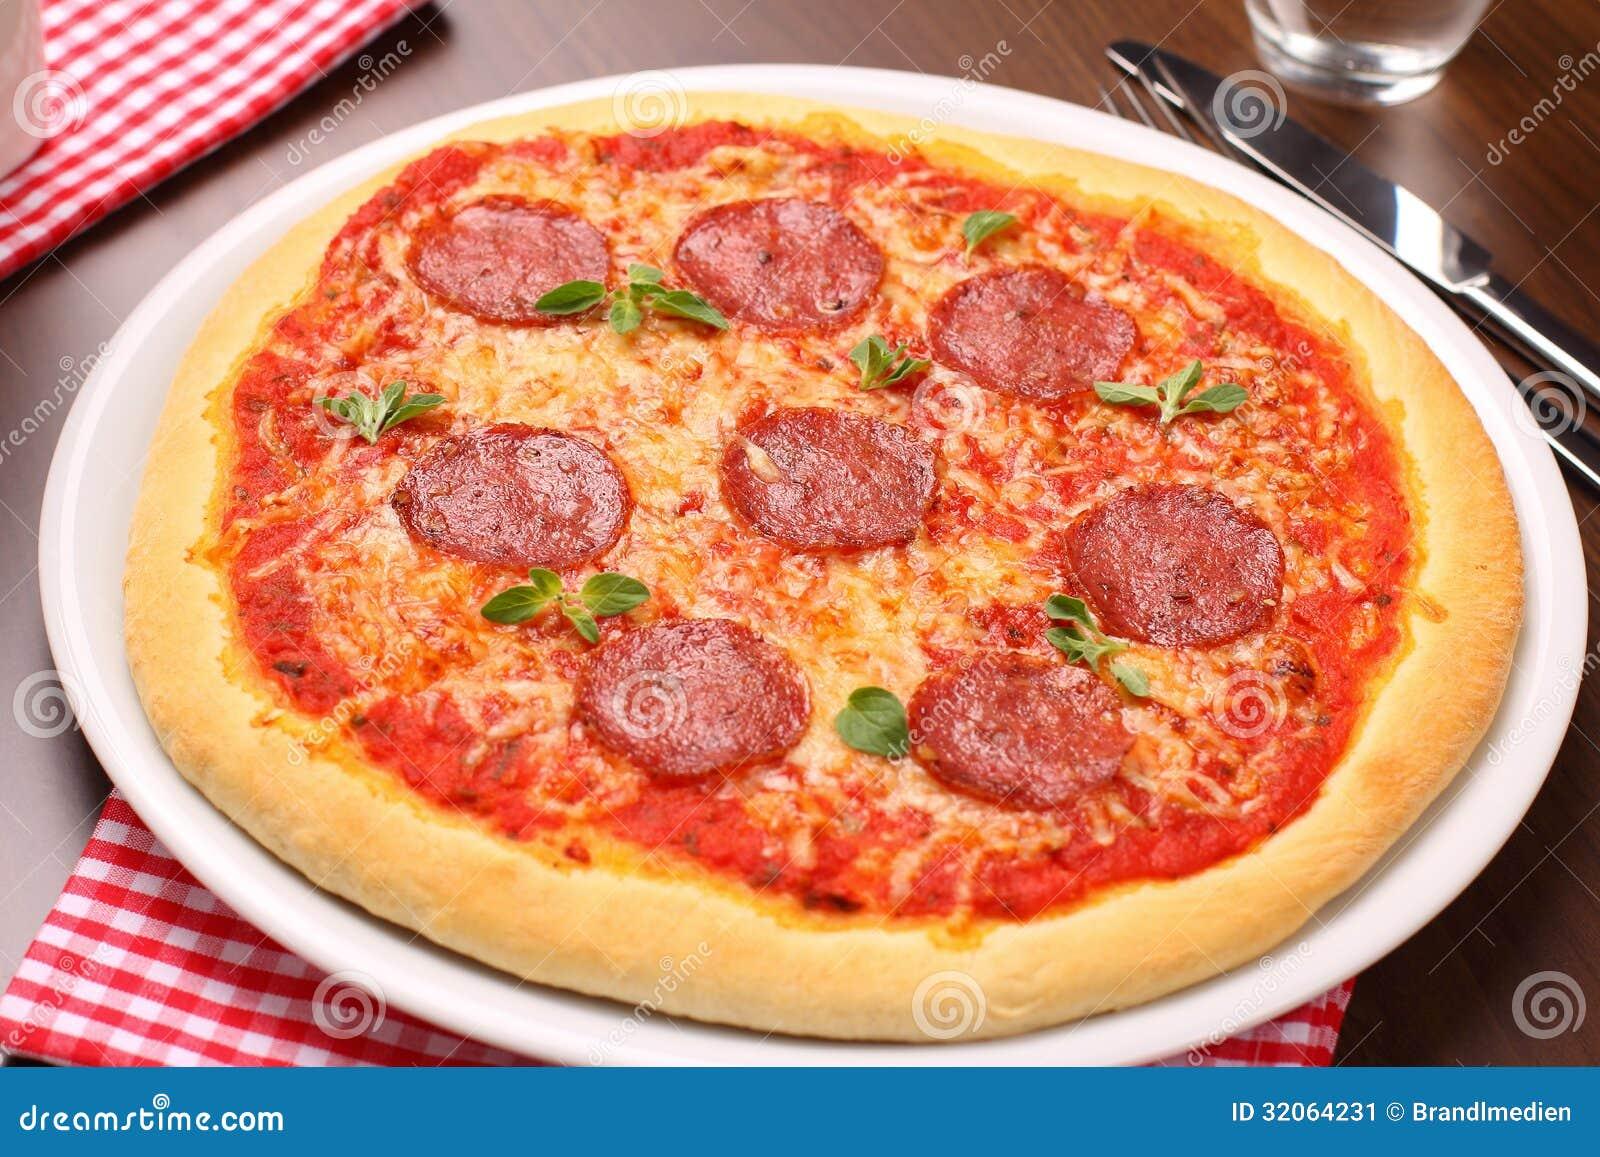 Salami Pizza Stock Image - Image: 32064231